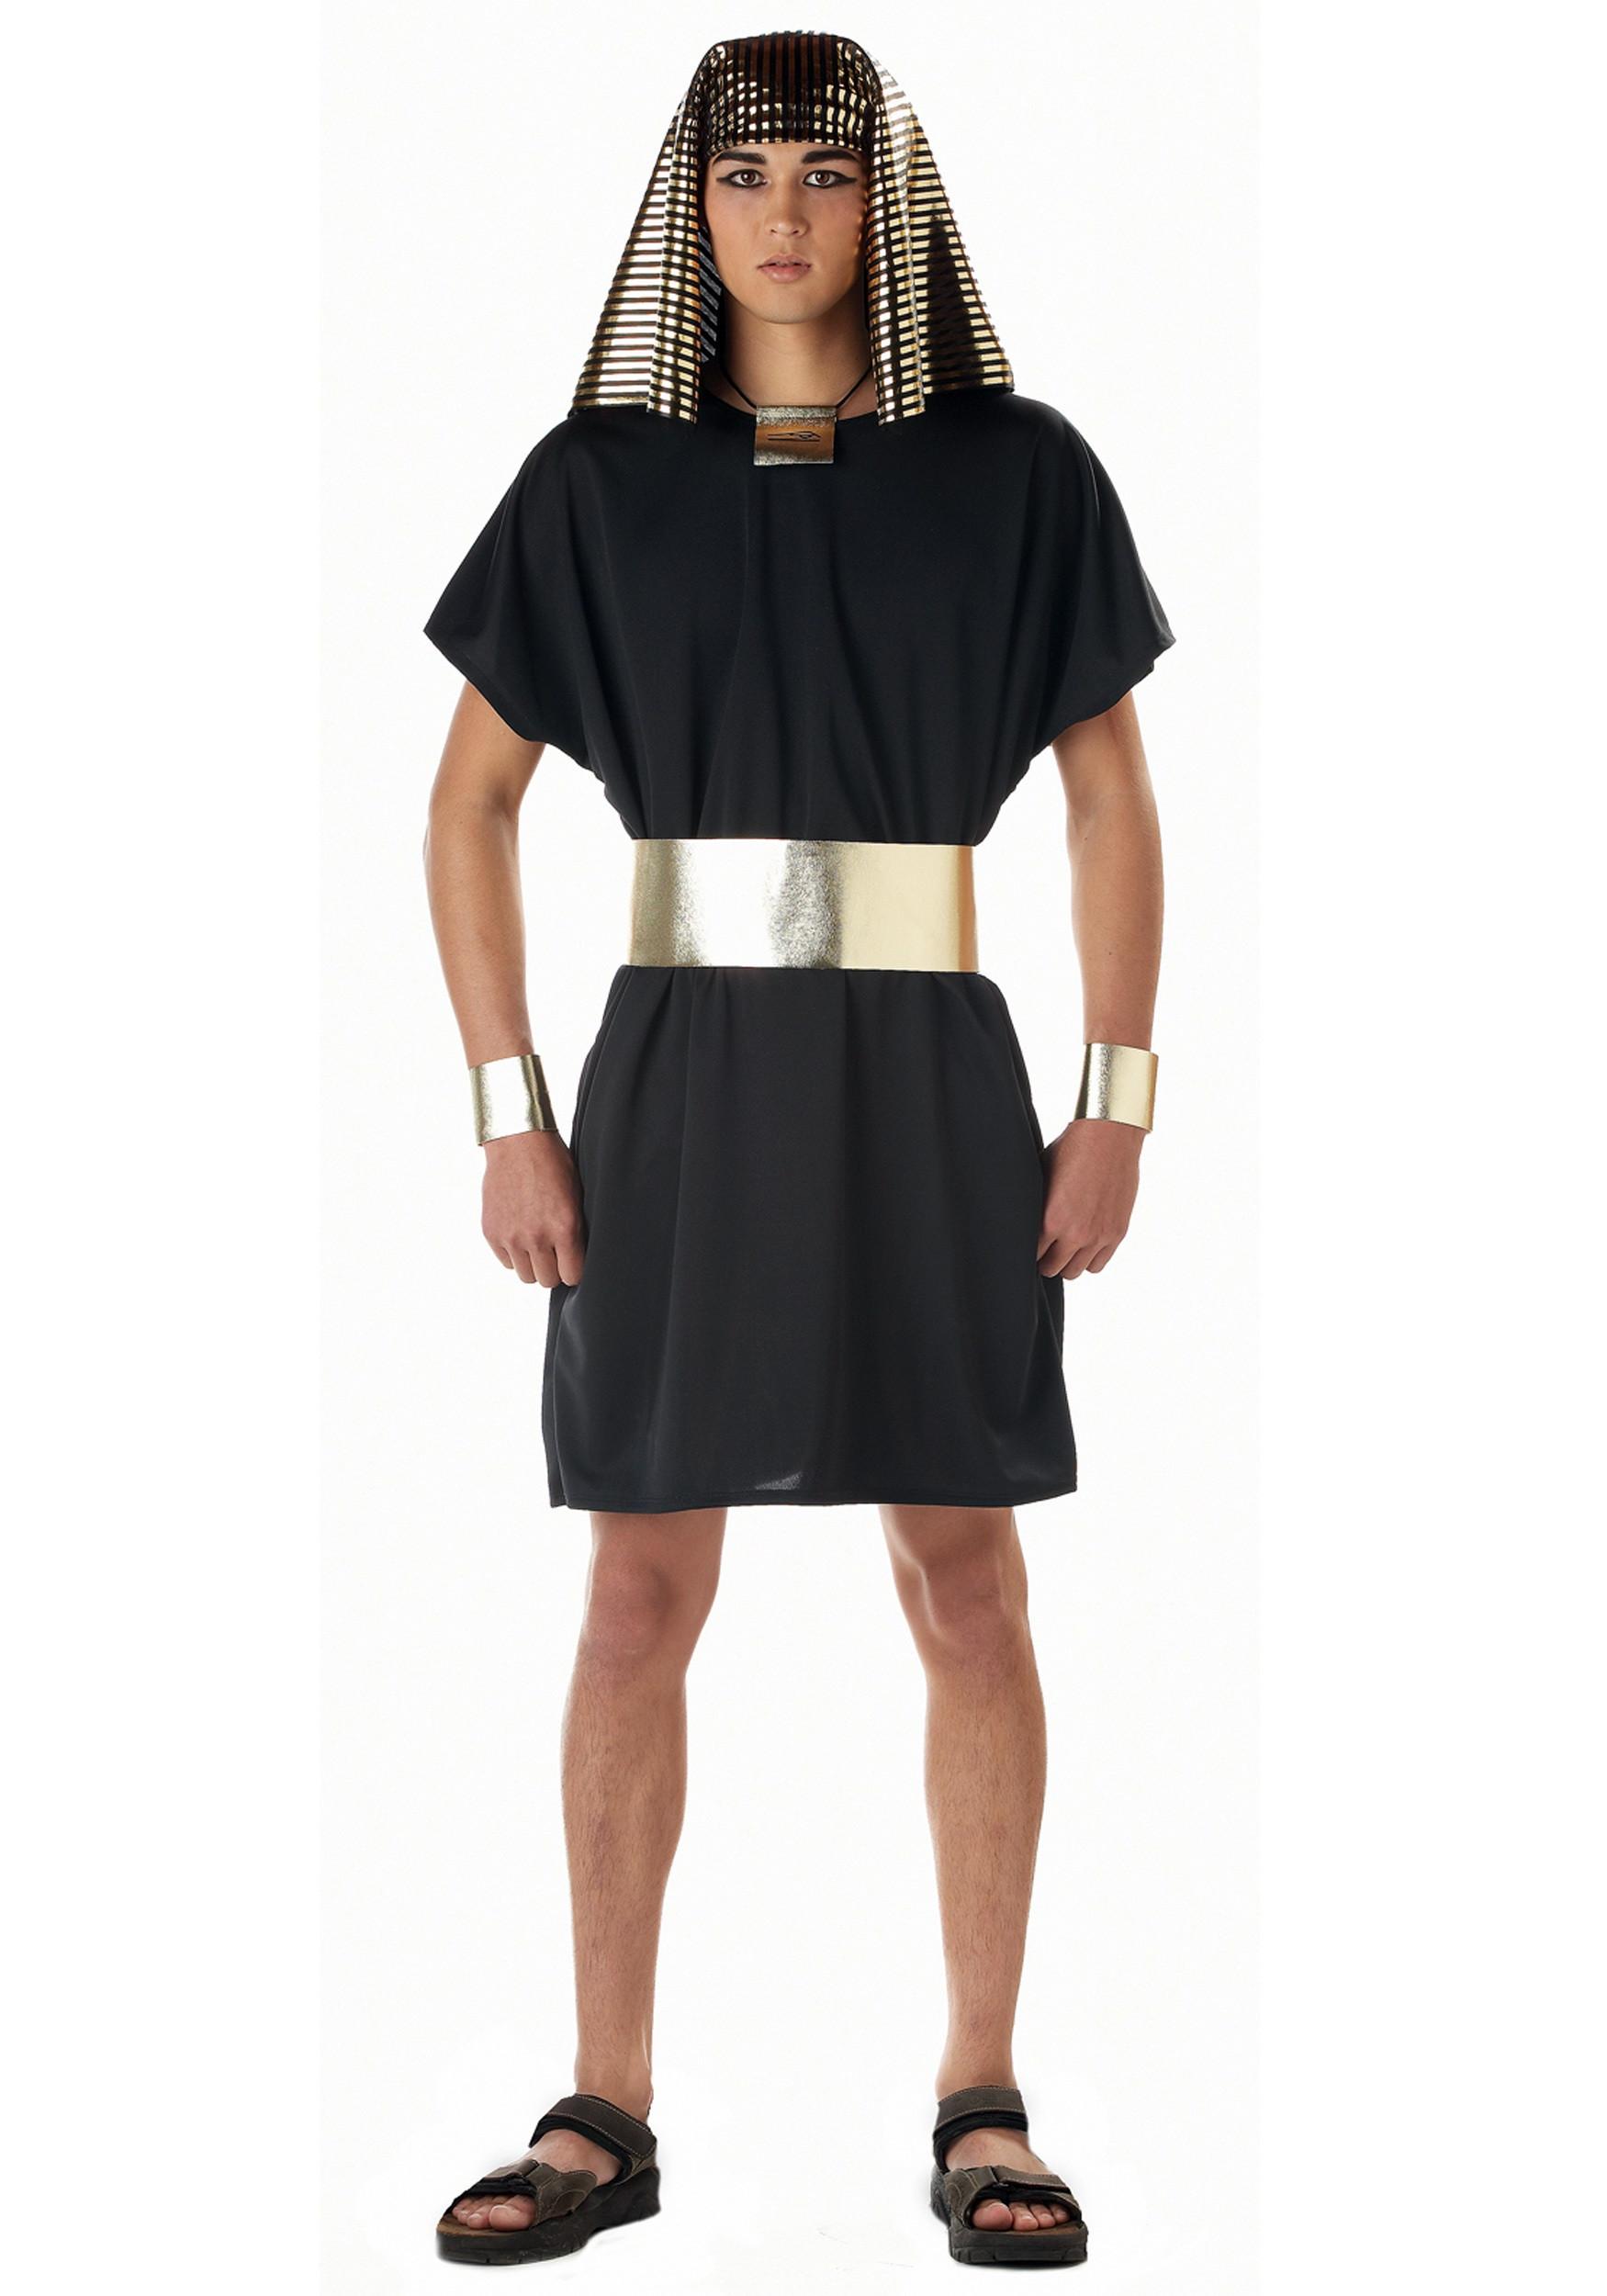 DIY Egyptian Costume  Adult Egyptian Pharaoh Costume